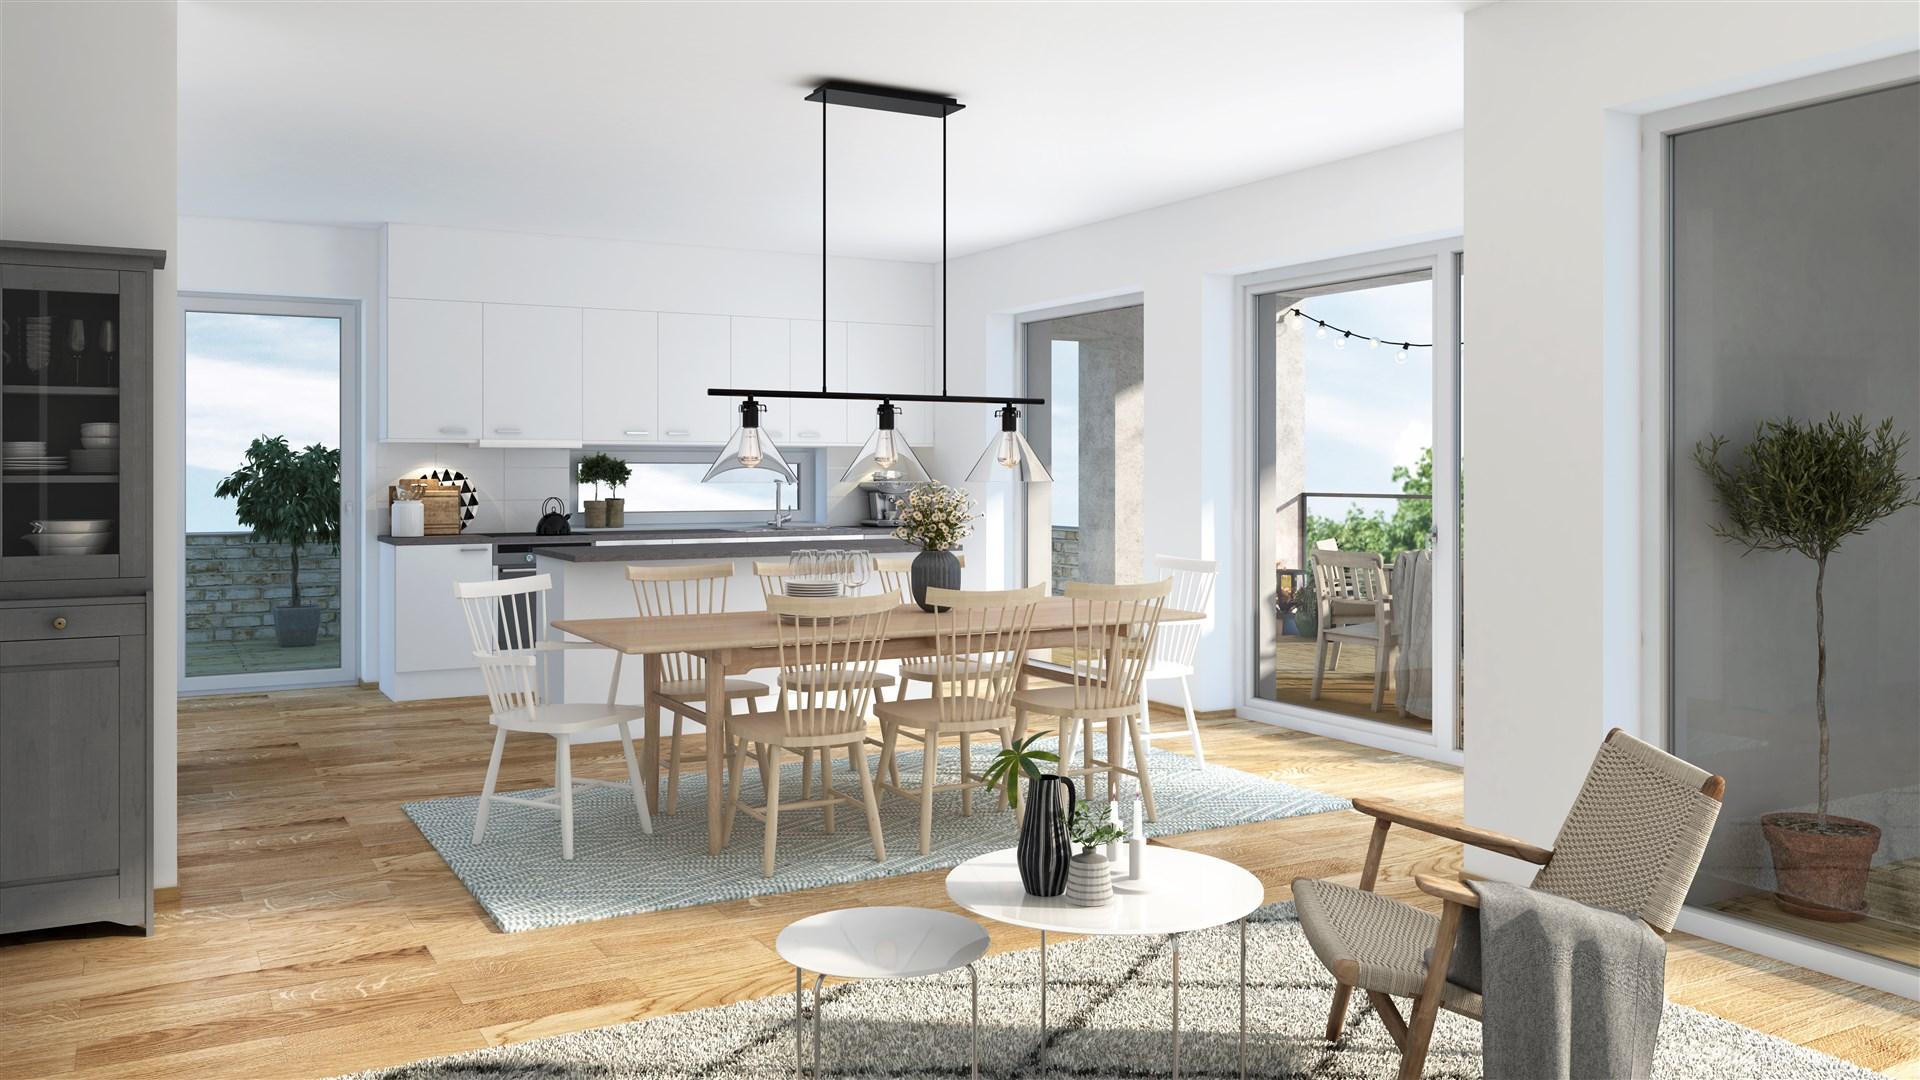 Illustration - vardagsrum/kök